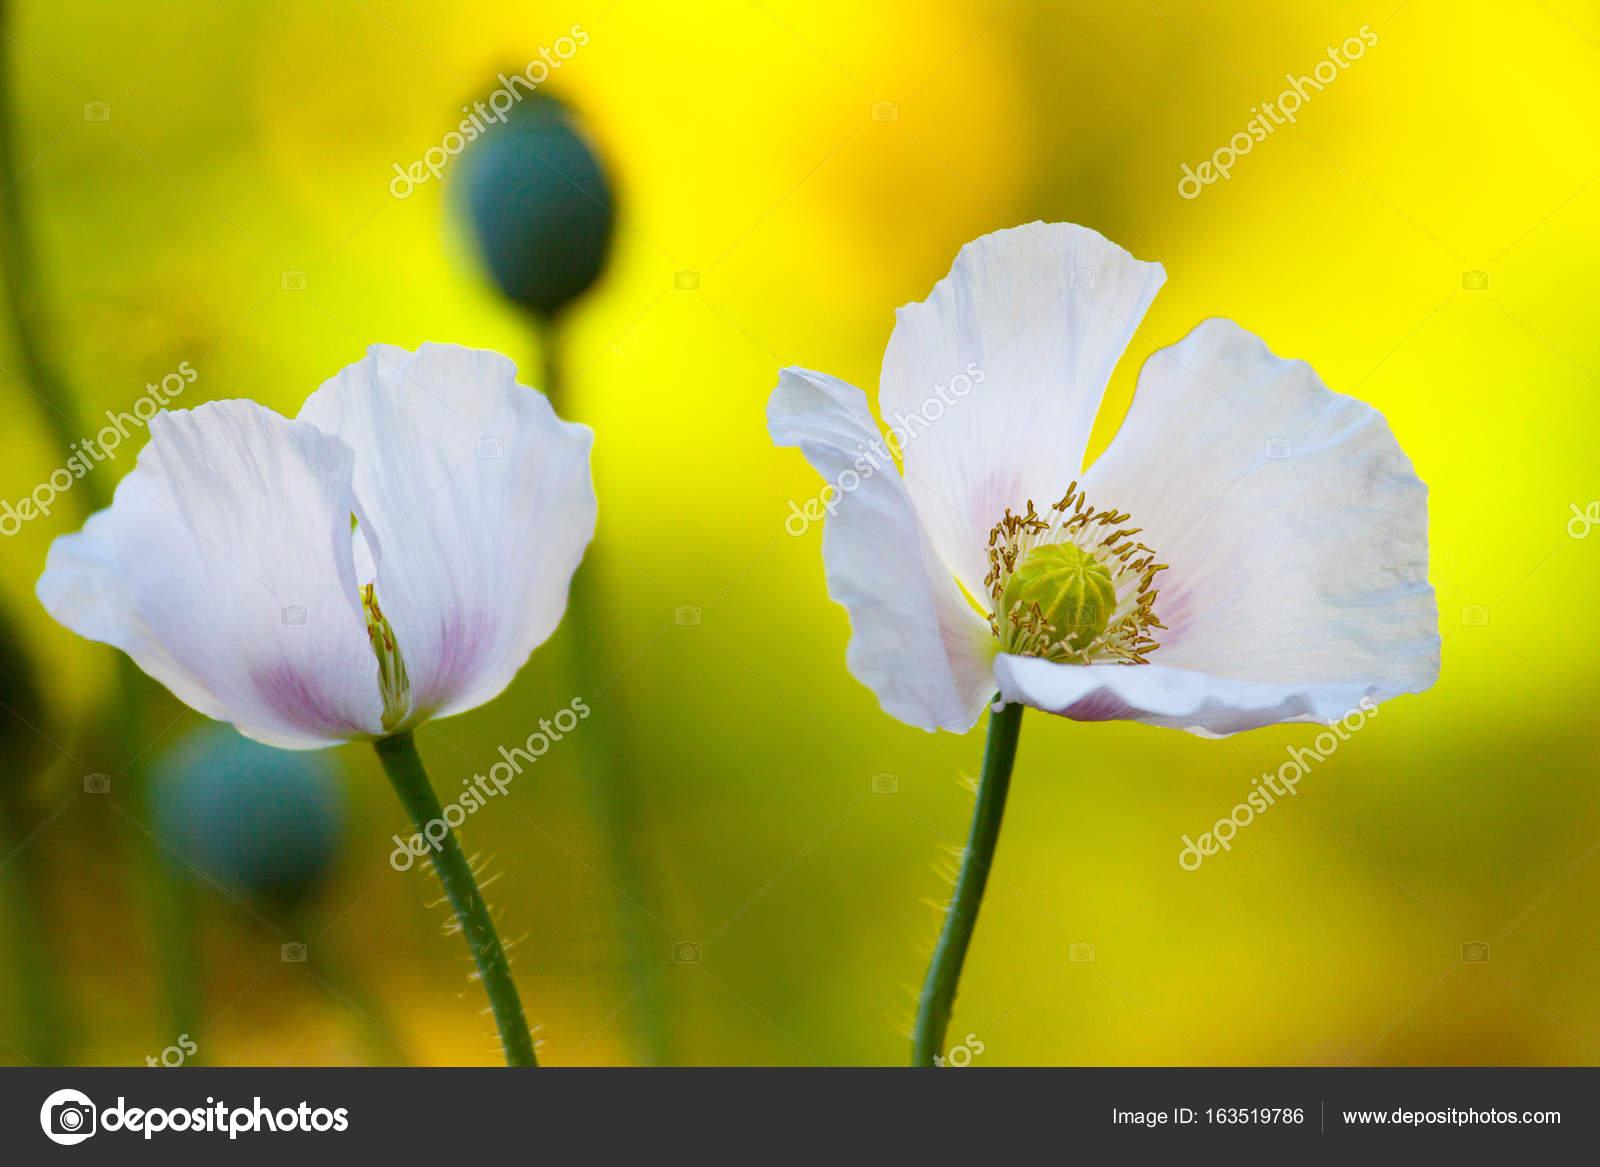 The Opium Poppy Flowers Stock Photo Sasapanchenkoail